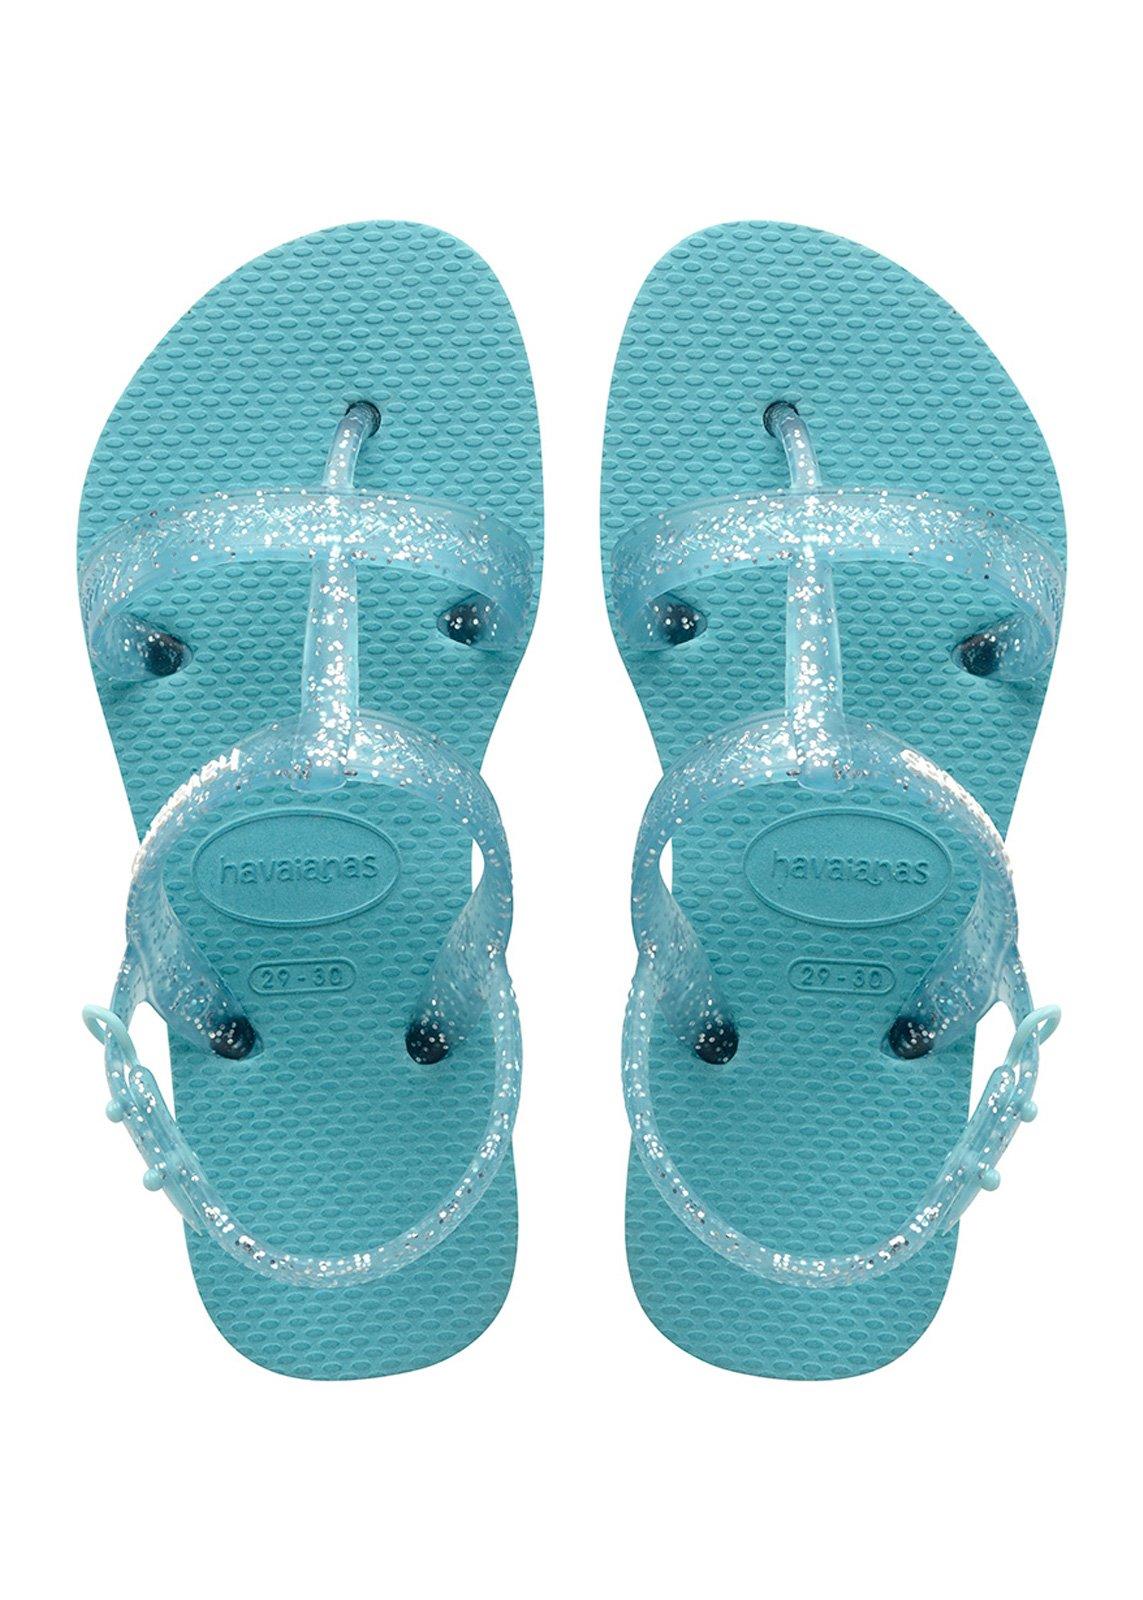 ba9da352ba6ce Flip-Flops Kids Joy Blue - Brand Havaianas